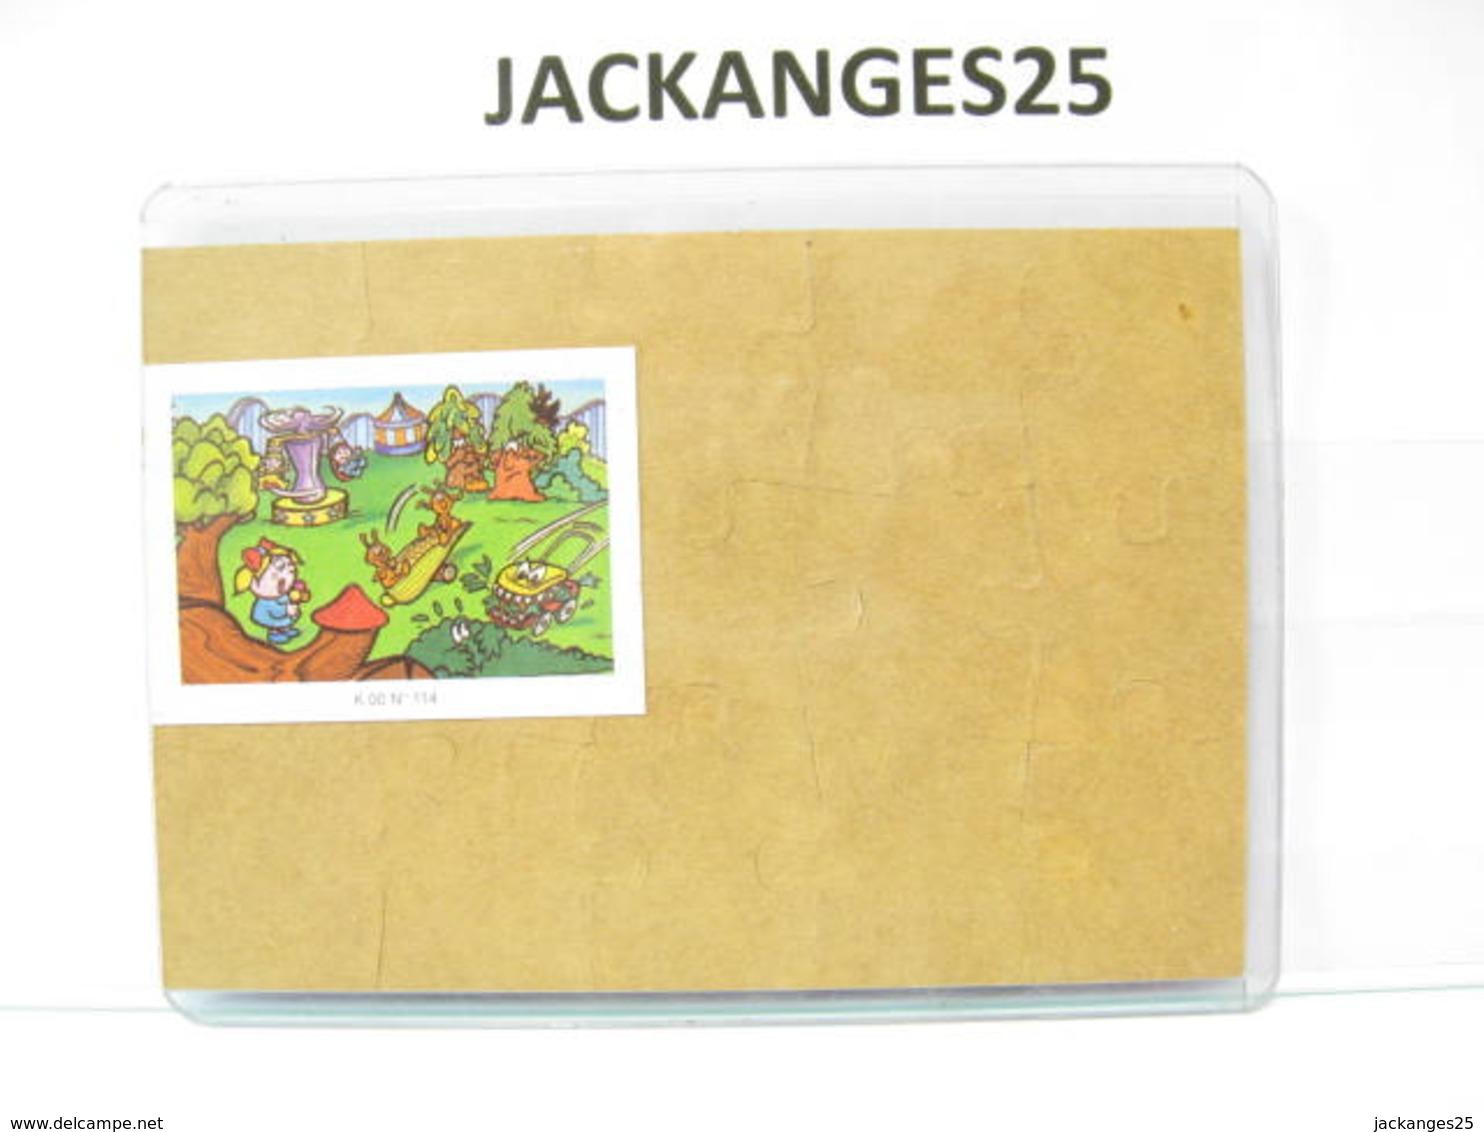 KINDER PUZZLE K00 N 114 1999 + BPZ - Puzzles